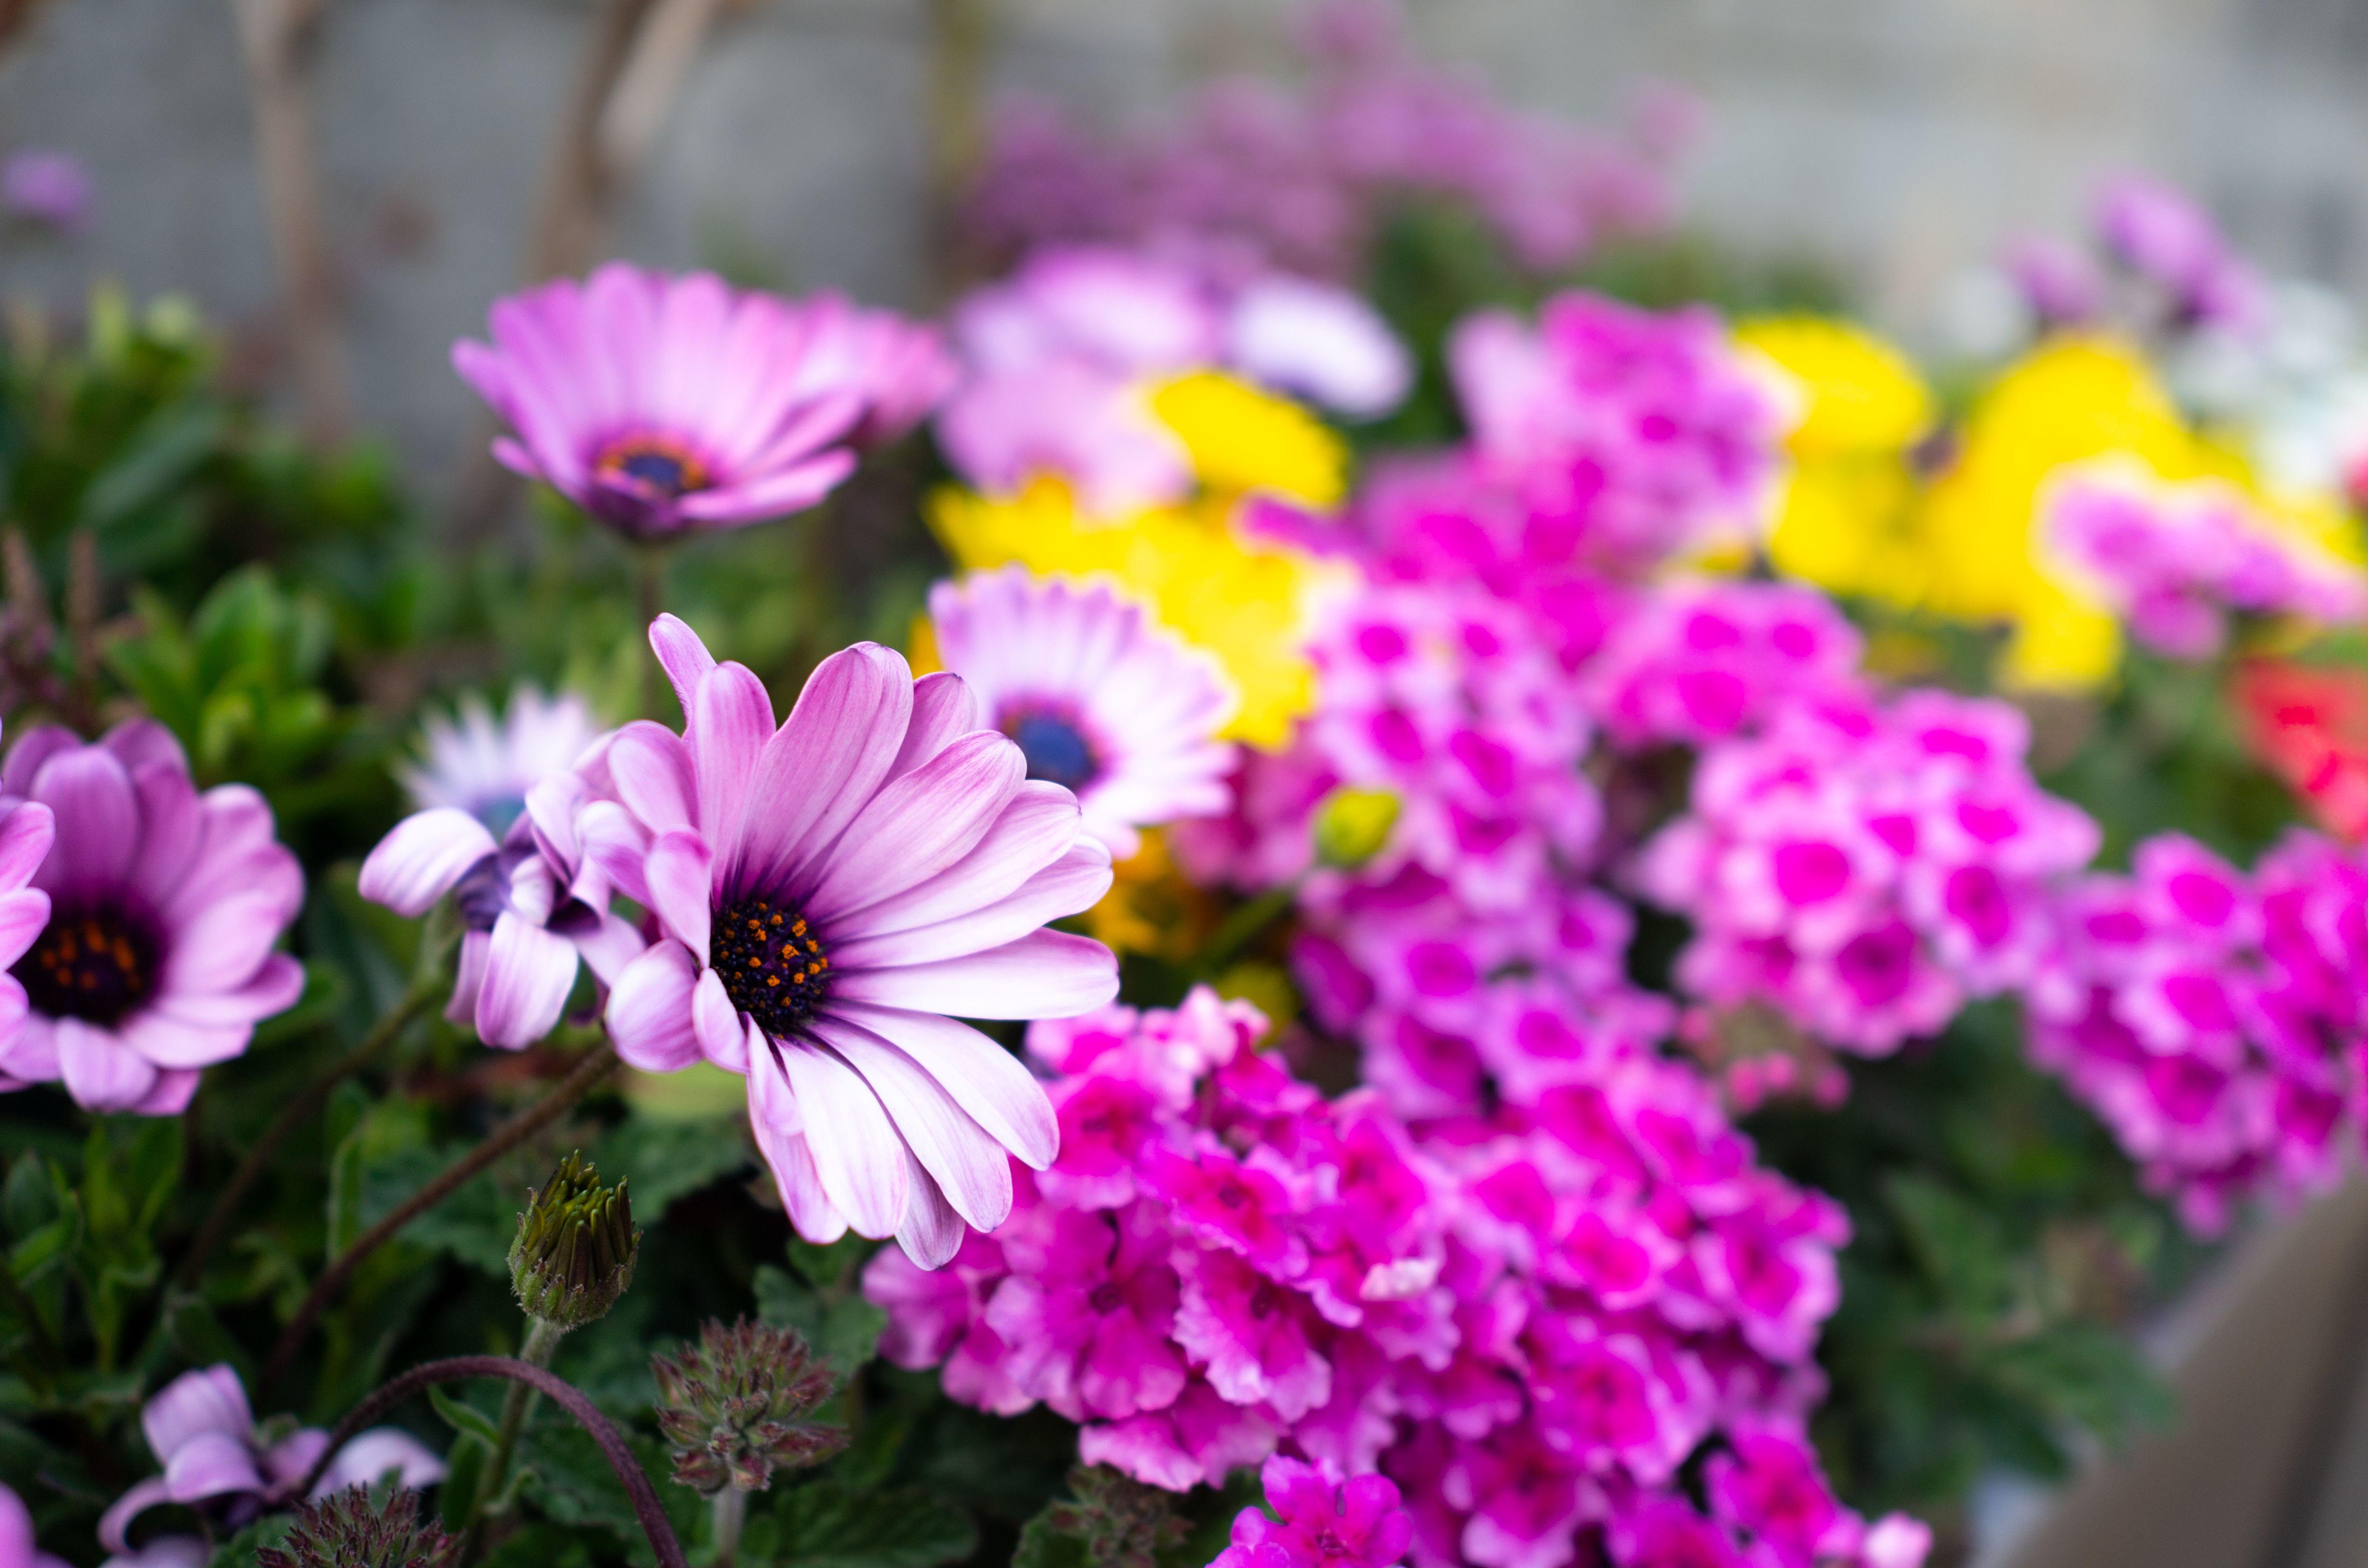 How To Grow Gerbera Daisy Outdoors Gerbera Daisy Care Gerbera